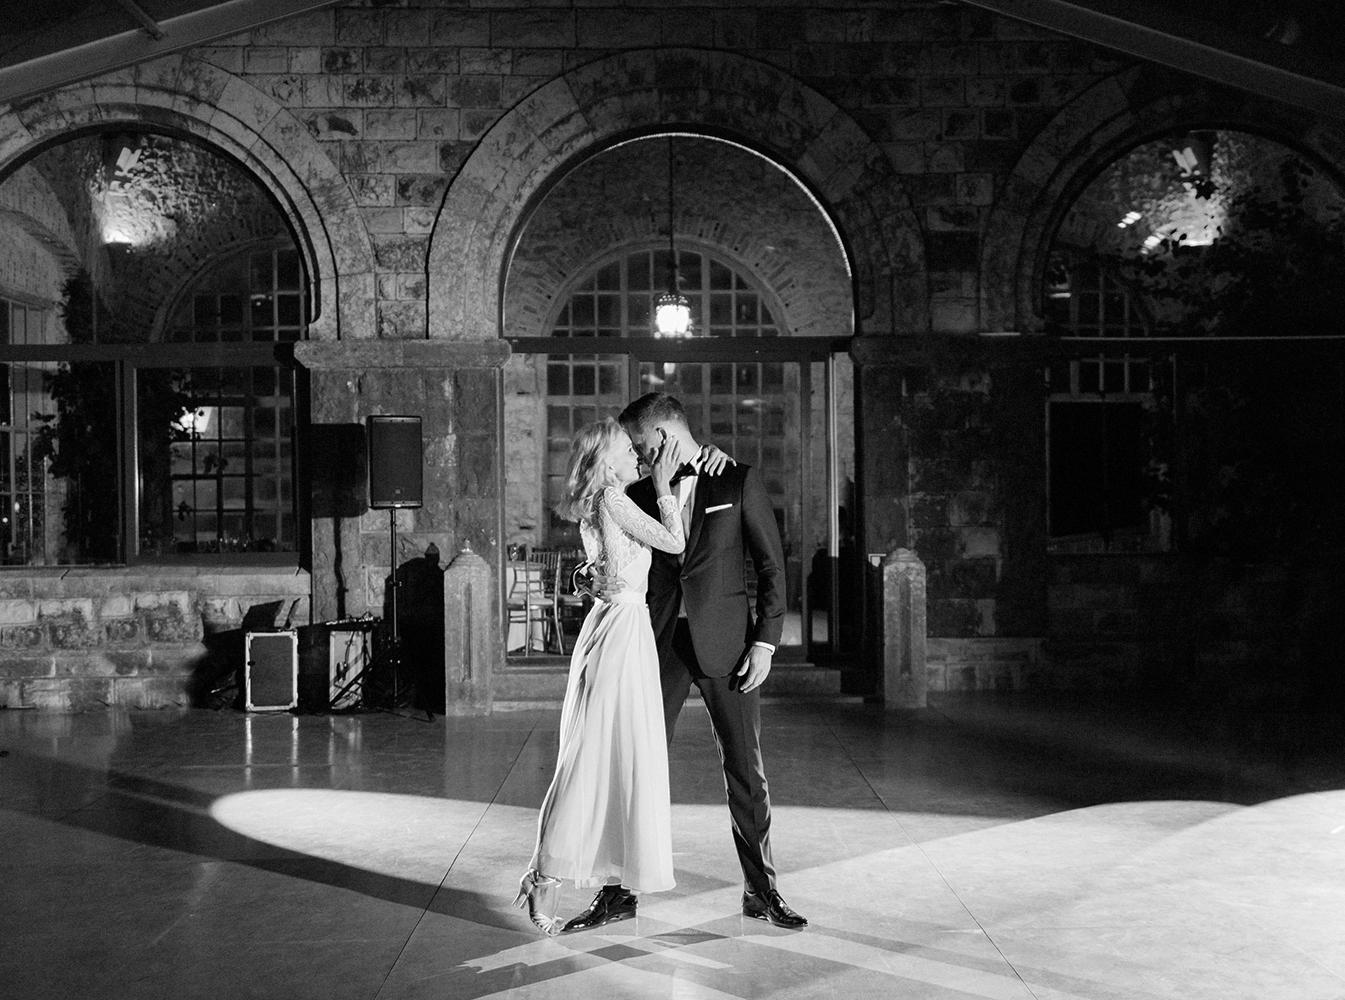 Nastia_Vesna_Photography_Wedding_Portugal_56.jpg